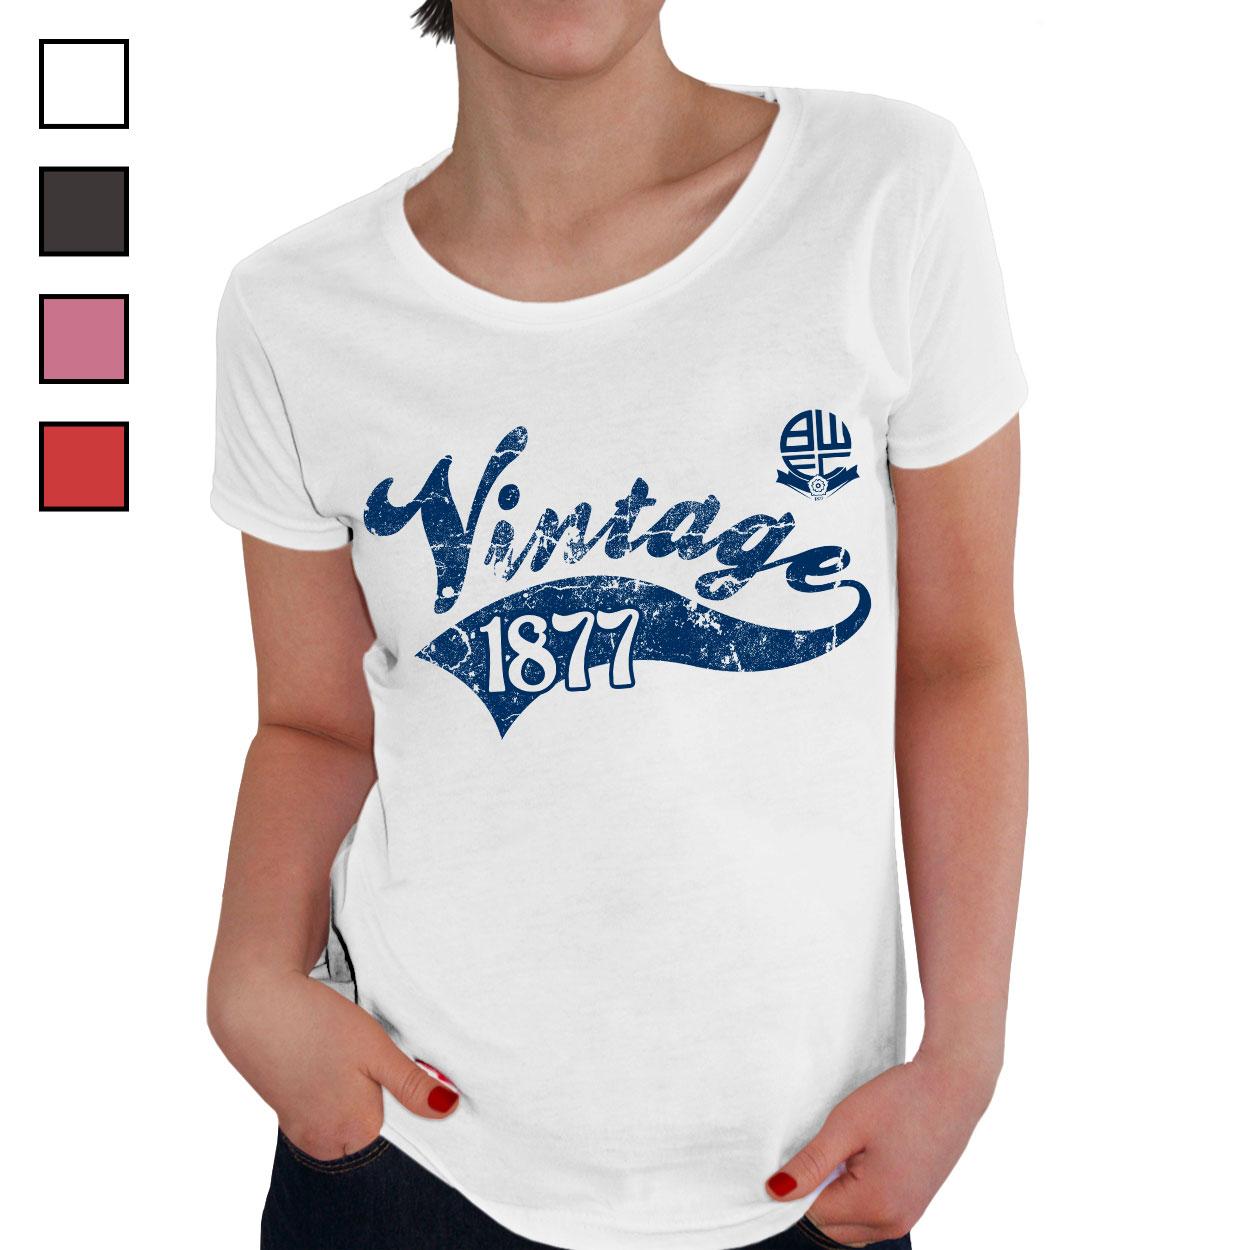 Bolton Wanderers FC Ladies Vintage T-Shirt